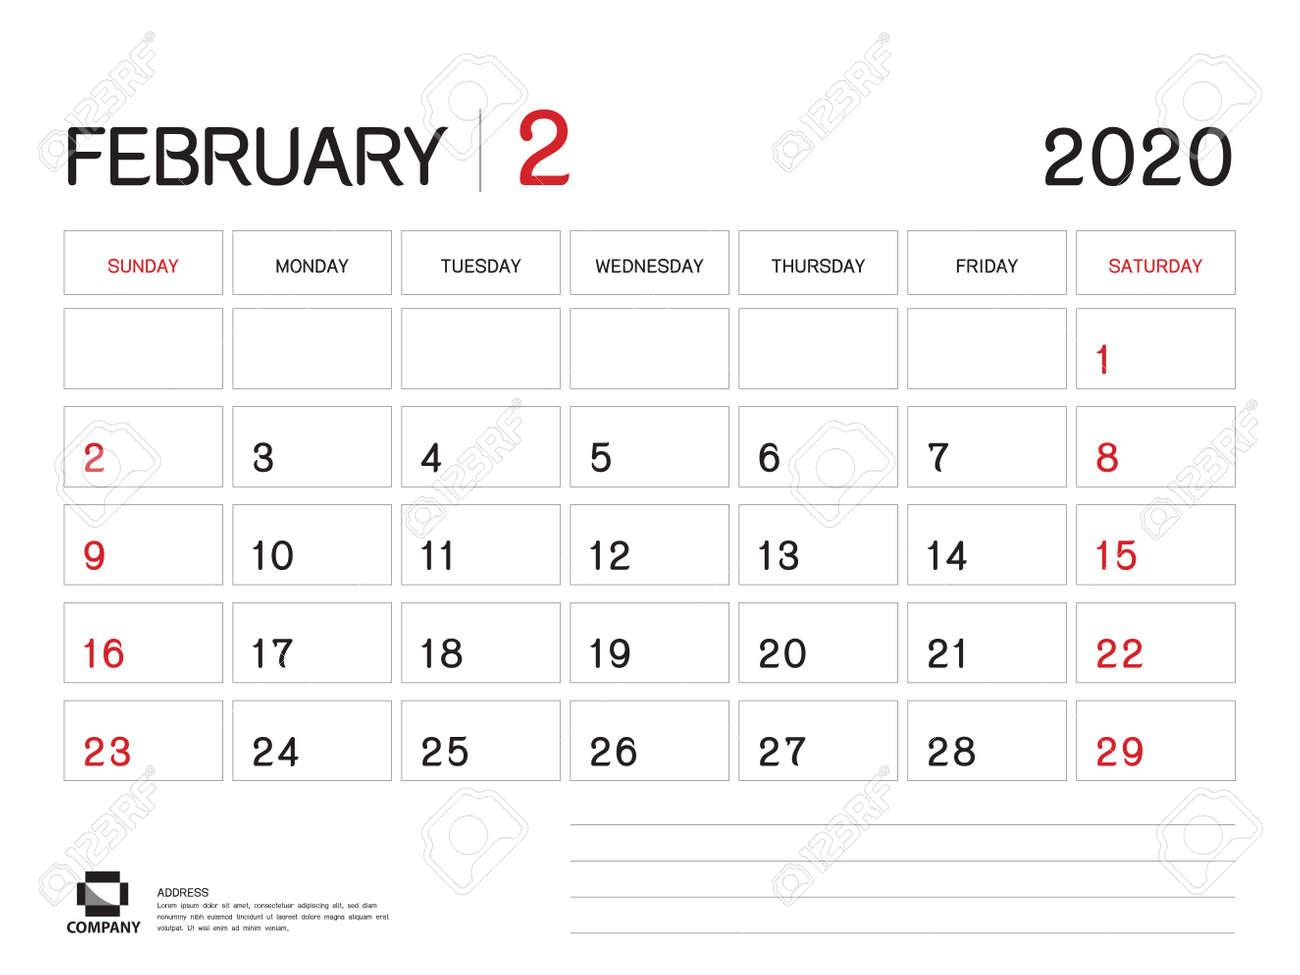 Ut Calendar 2020 FEBRUARY 2020 Year Template, Calendar 2020 Vector, Desk Calendar